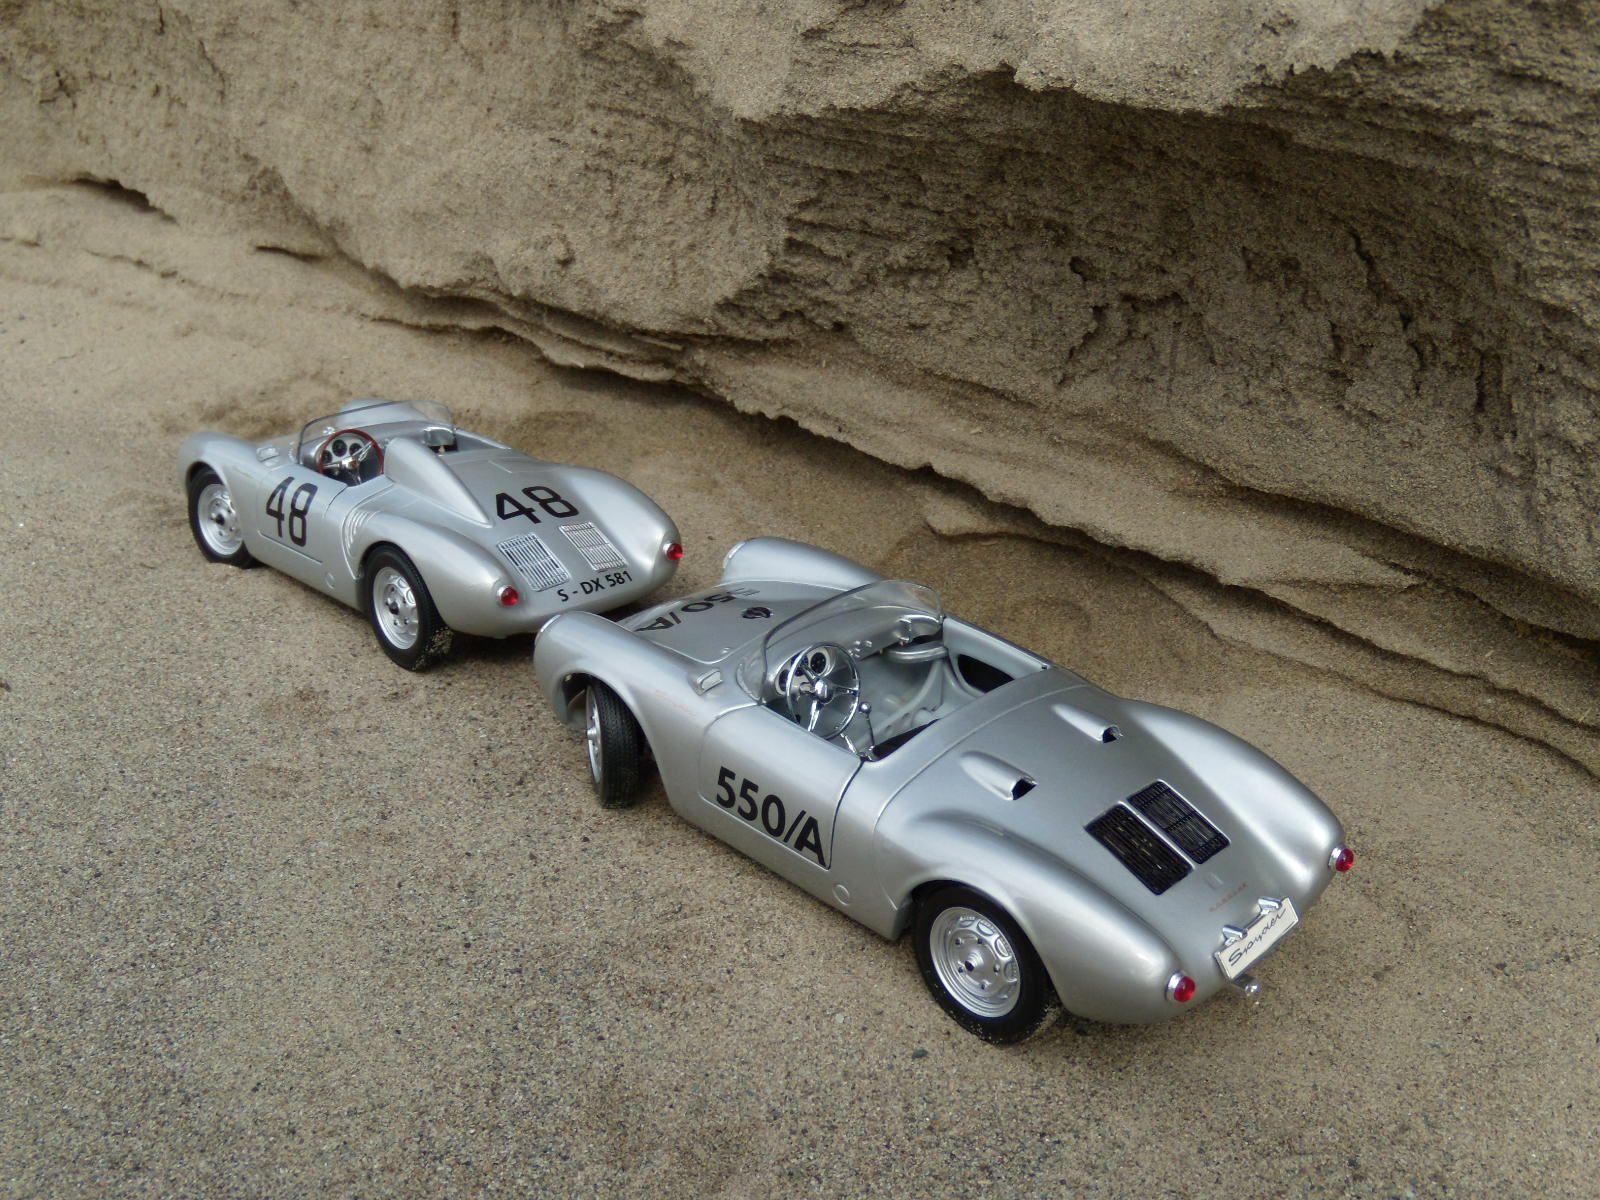 e83bb2905695042da712d7d346feae97 Outstanding Maisto Porsche 911 Gt1 Le Mans 1998 Cars Trend